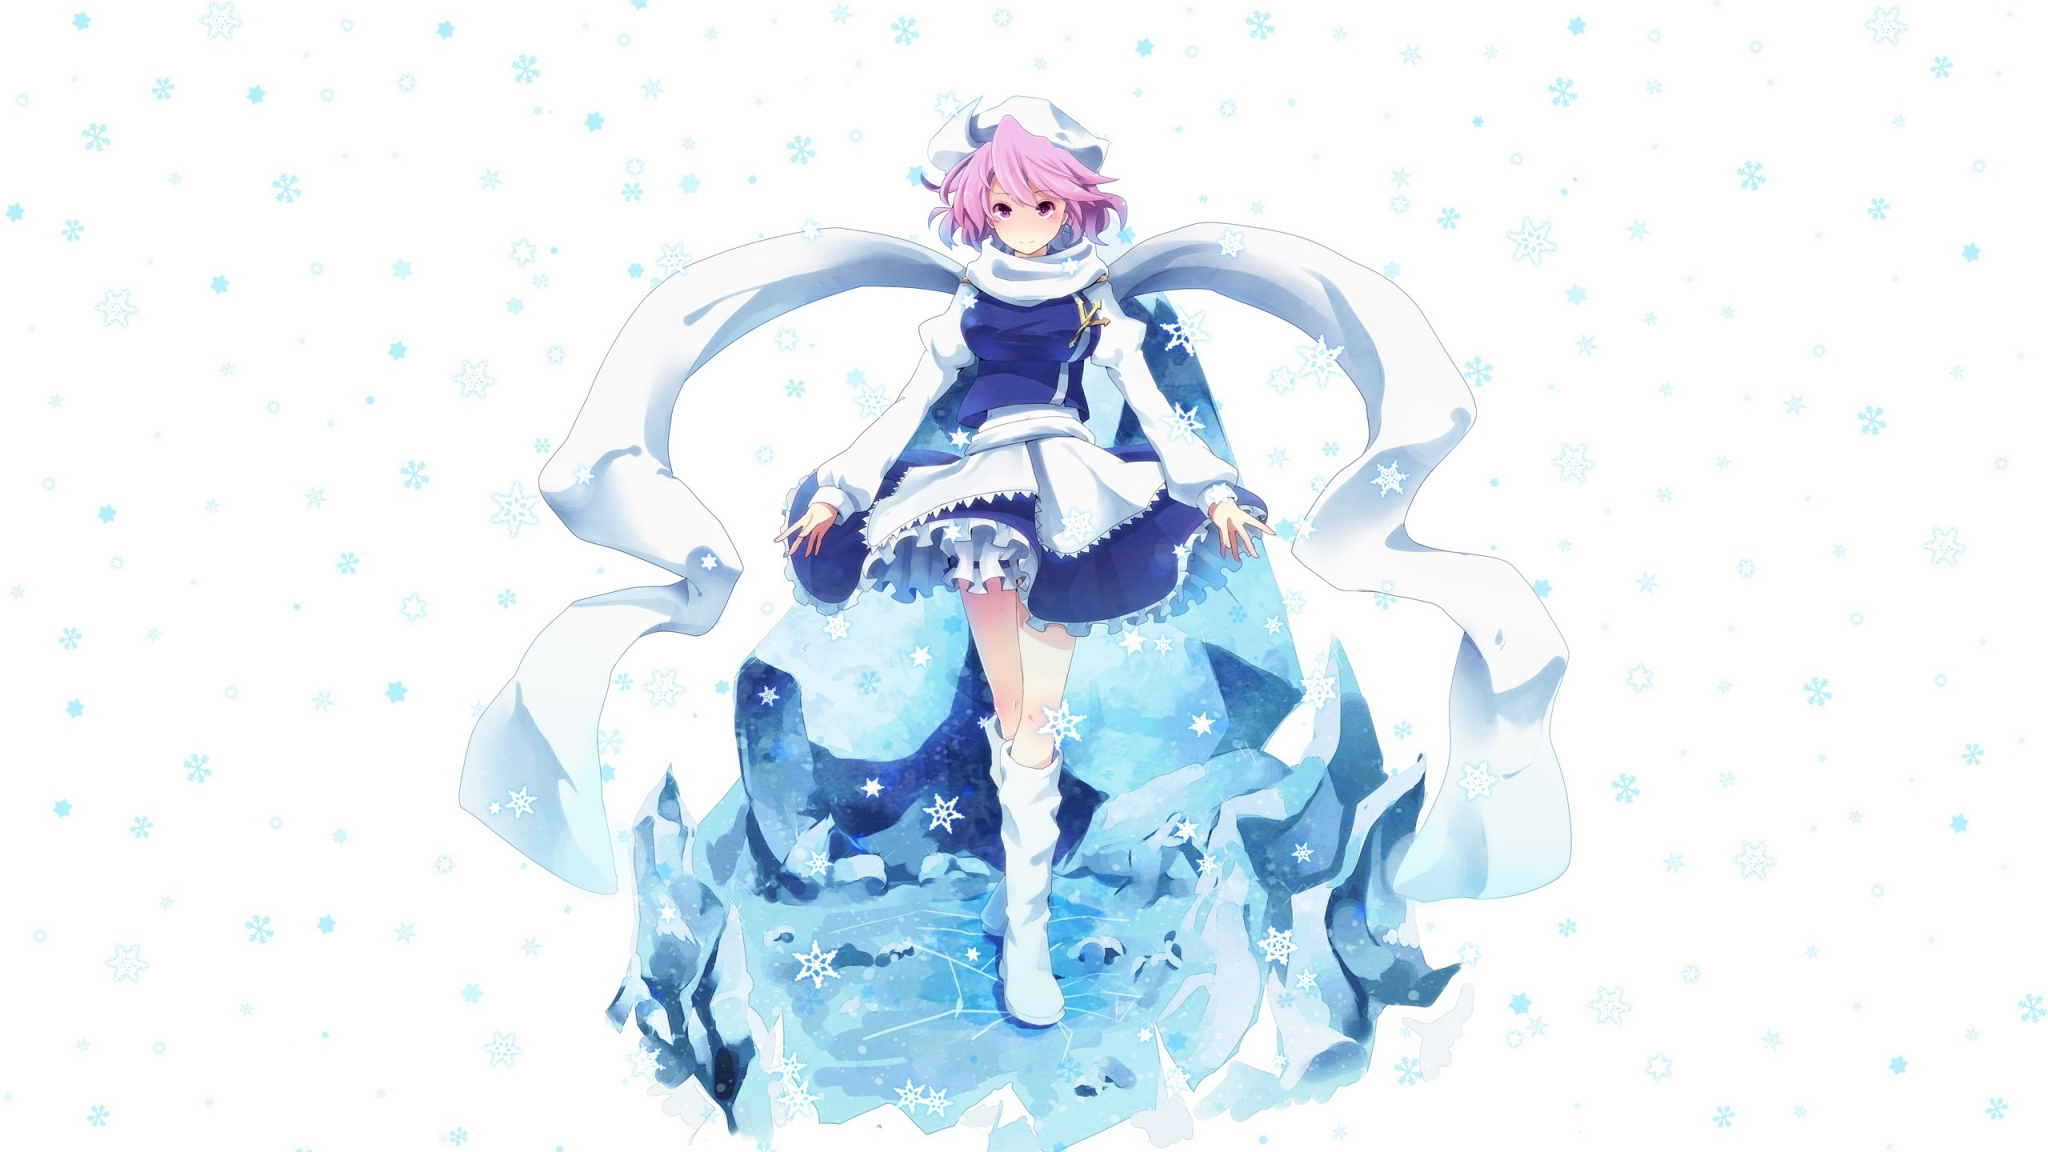 Free Snow Falling Wallpaper Anime Girl Style Image Pixelstalk Net